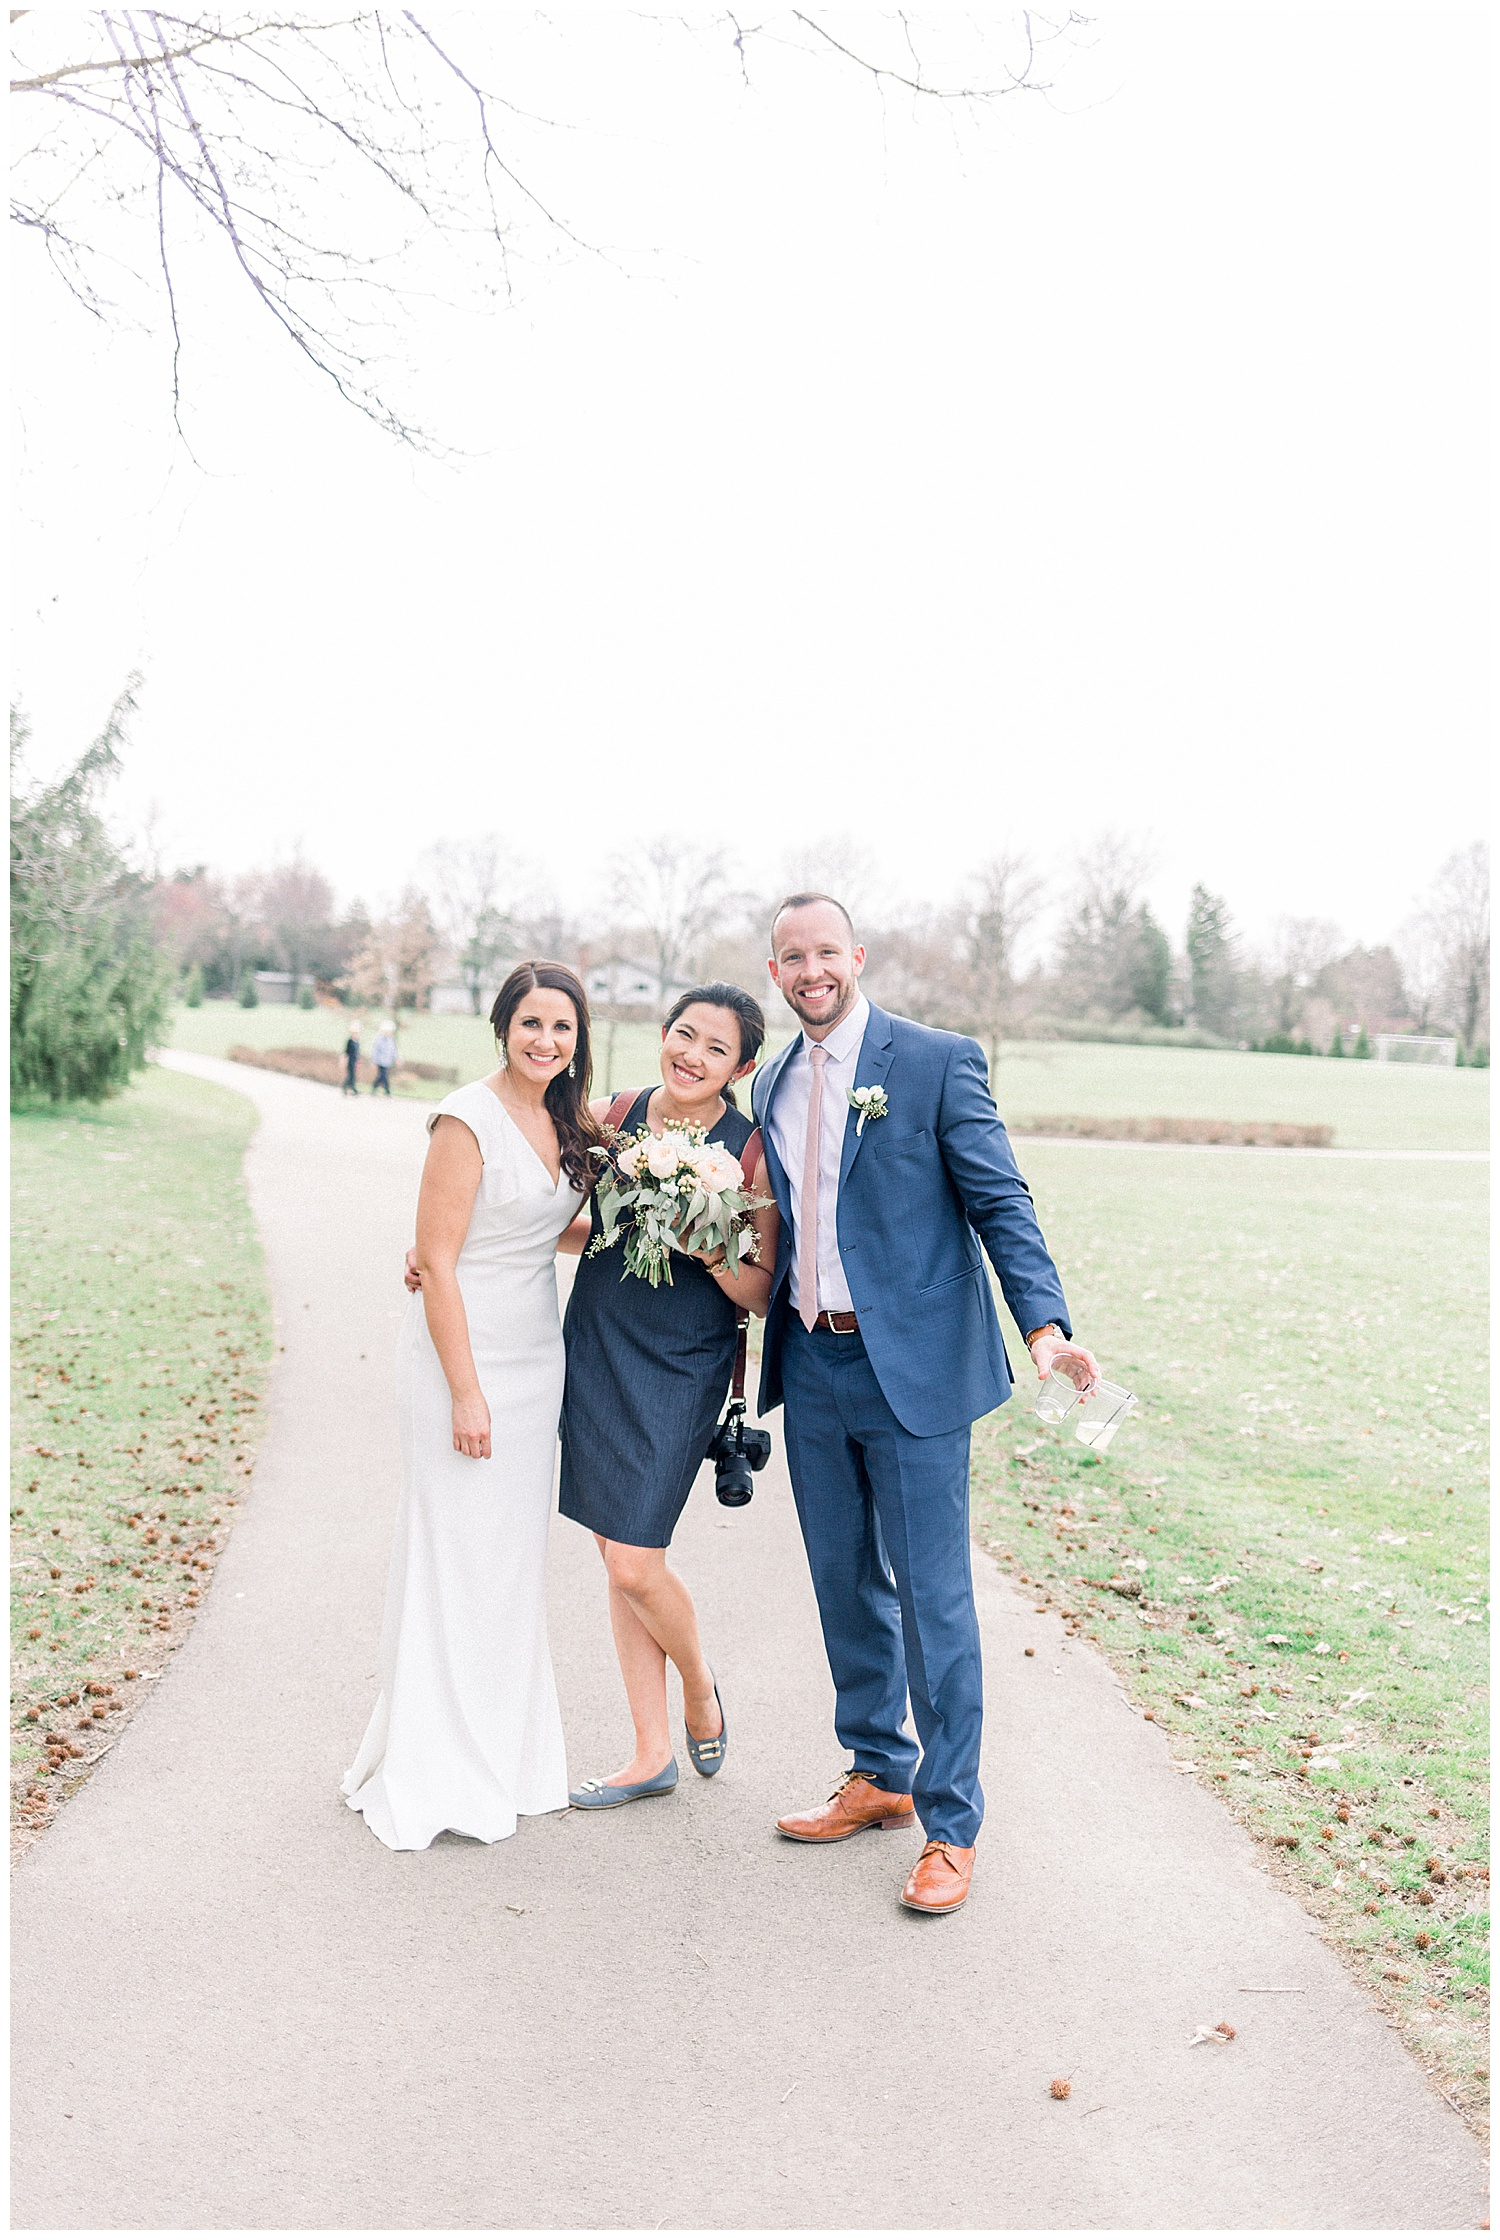 christine kim owner of ji cherir photography cincinnati, oh wedding photographer specializing in film and digital fine art wedding photographer